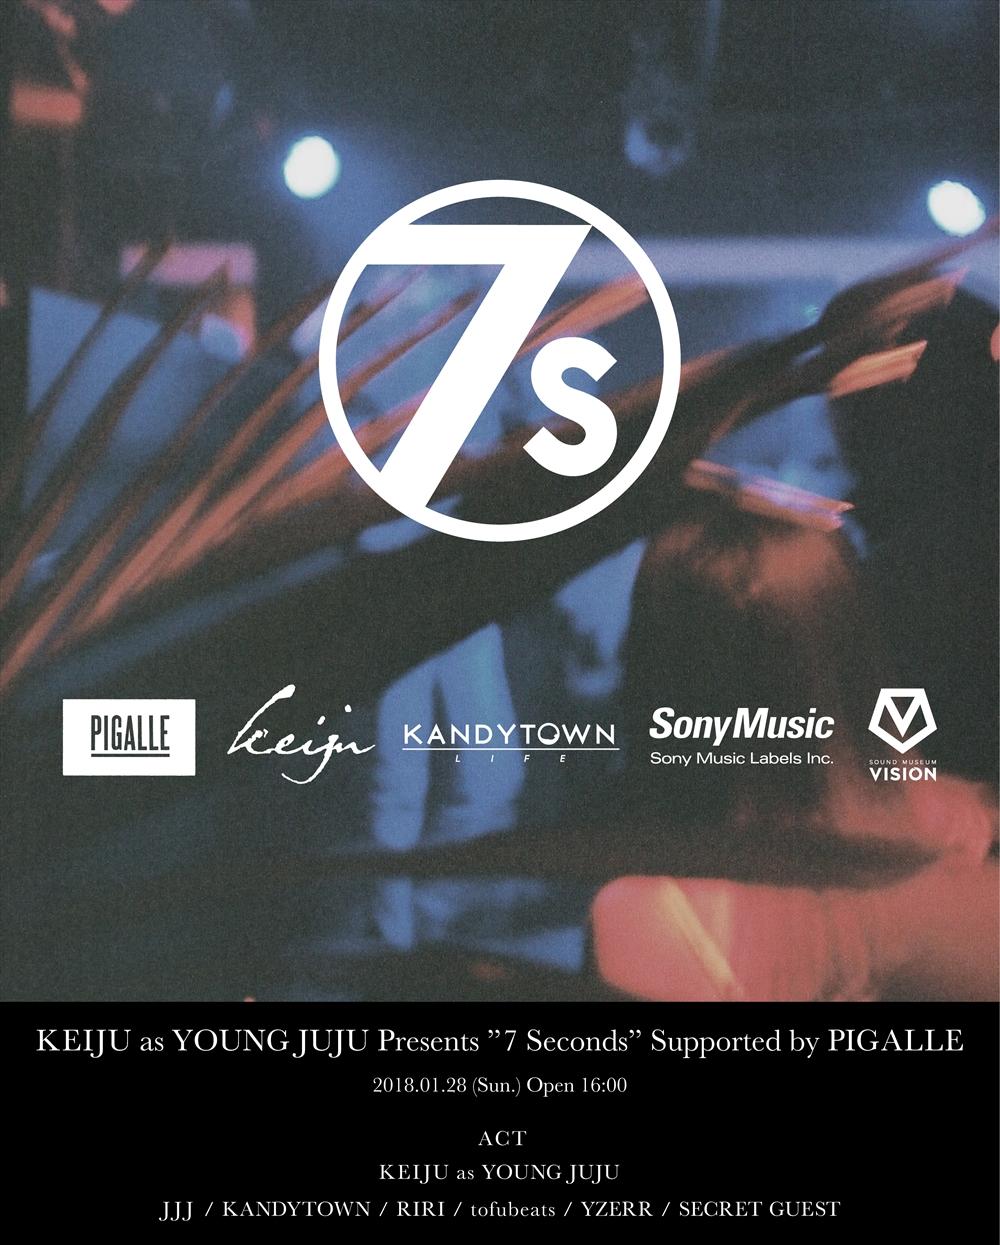 tofubeats、JJJ、YZERRら、KEIJU as YOUNG JUJUローンチパーティー追加出演者が発表サムネイル画像